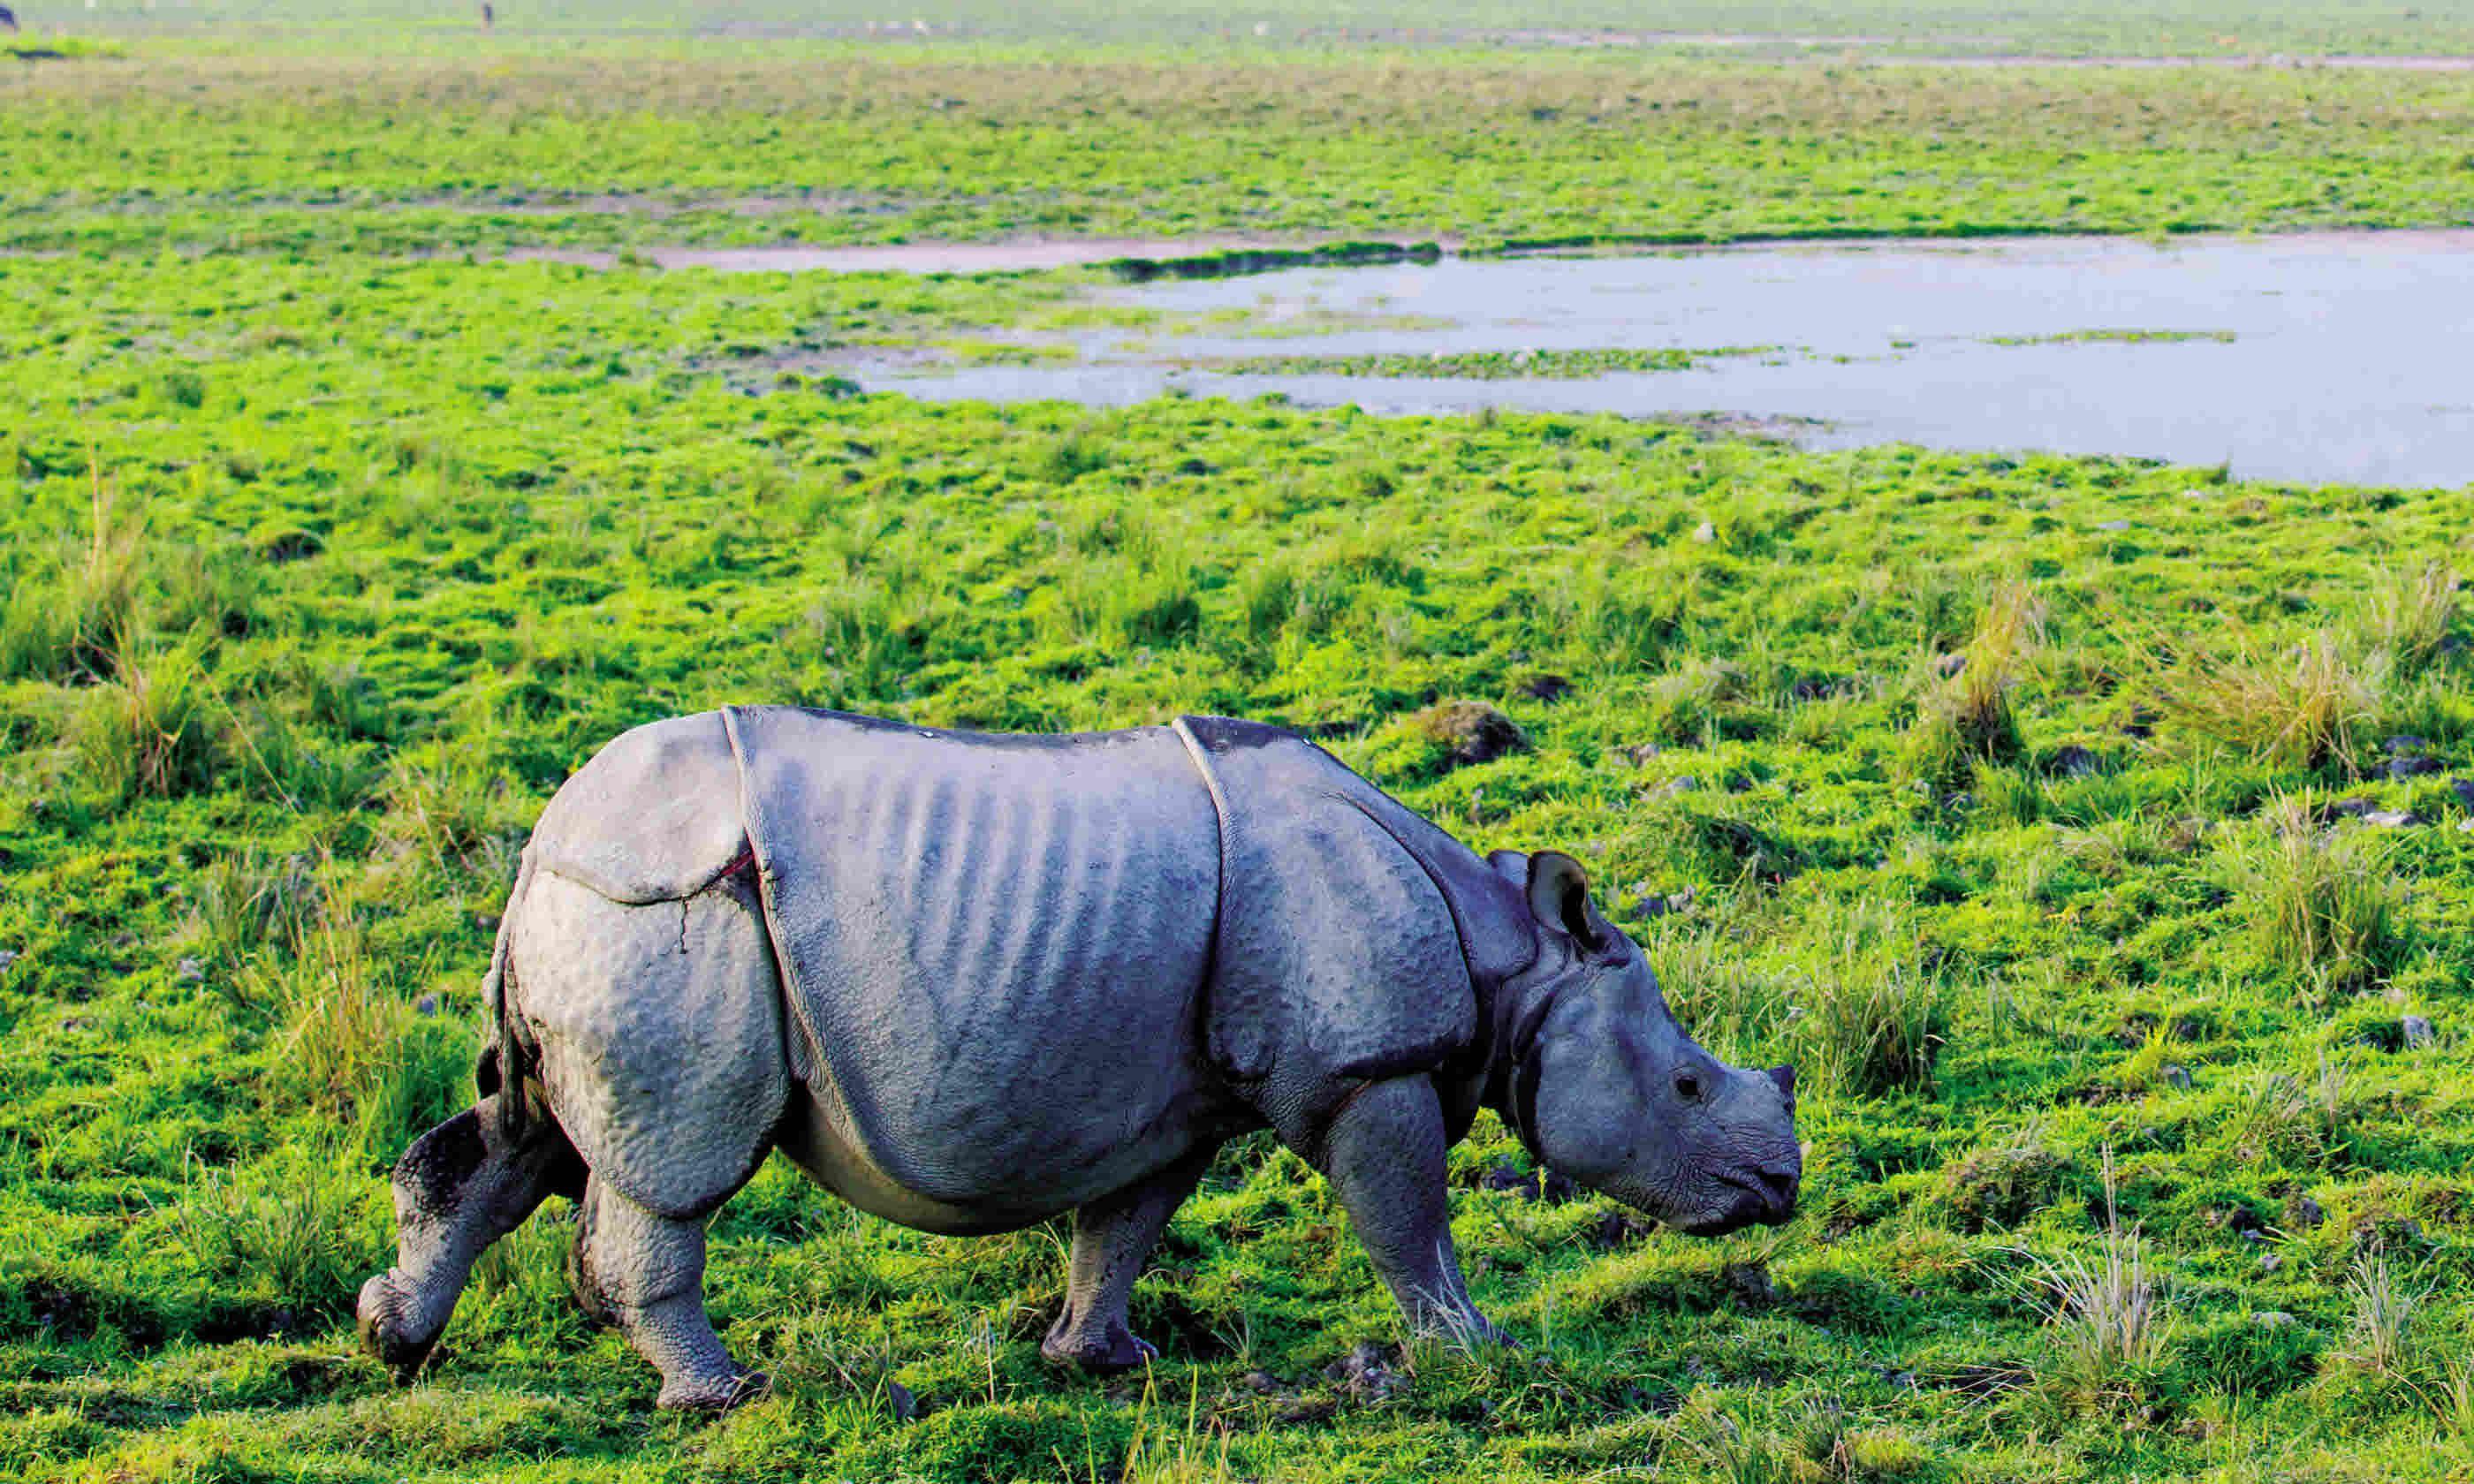 Rhino in Assam (Dreamstime)